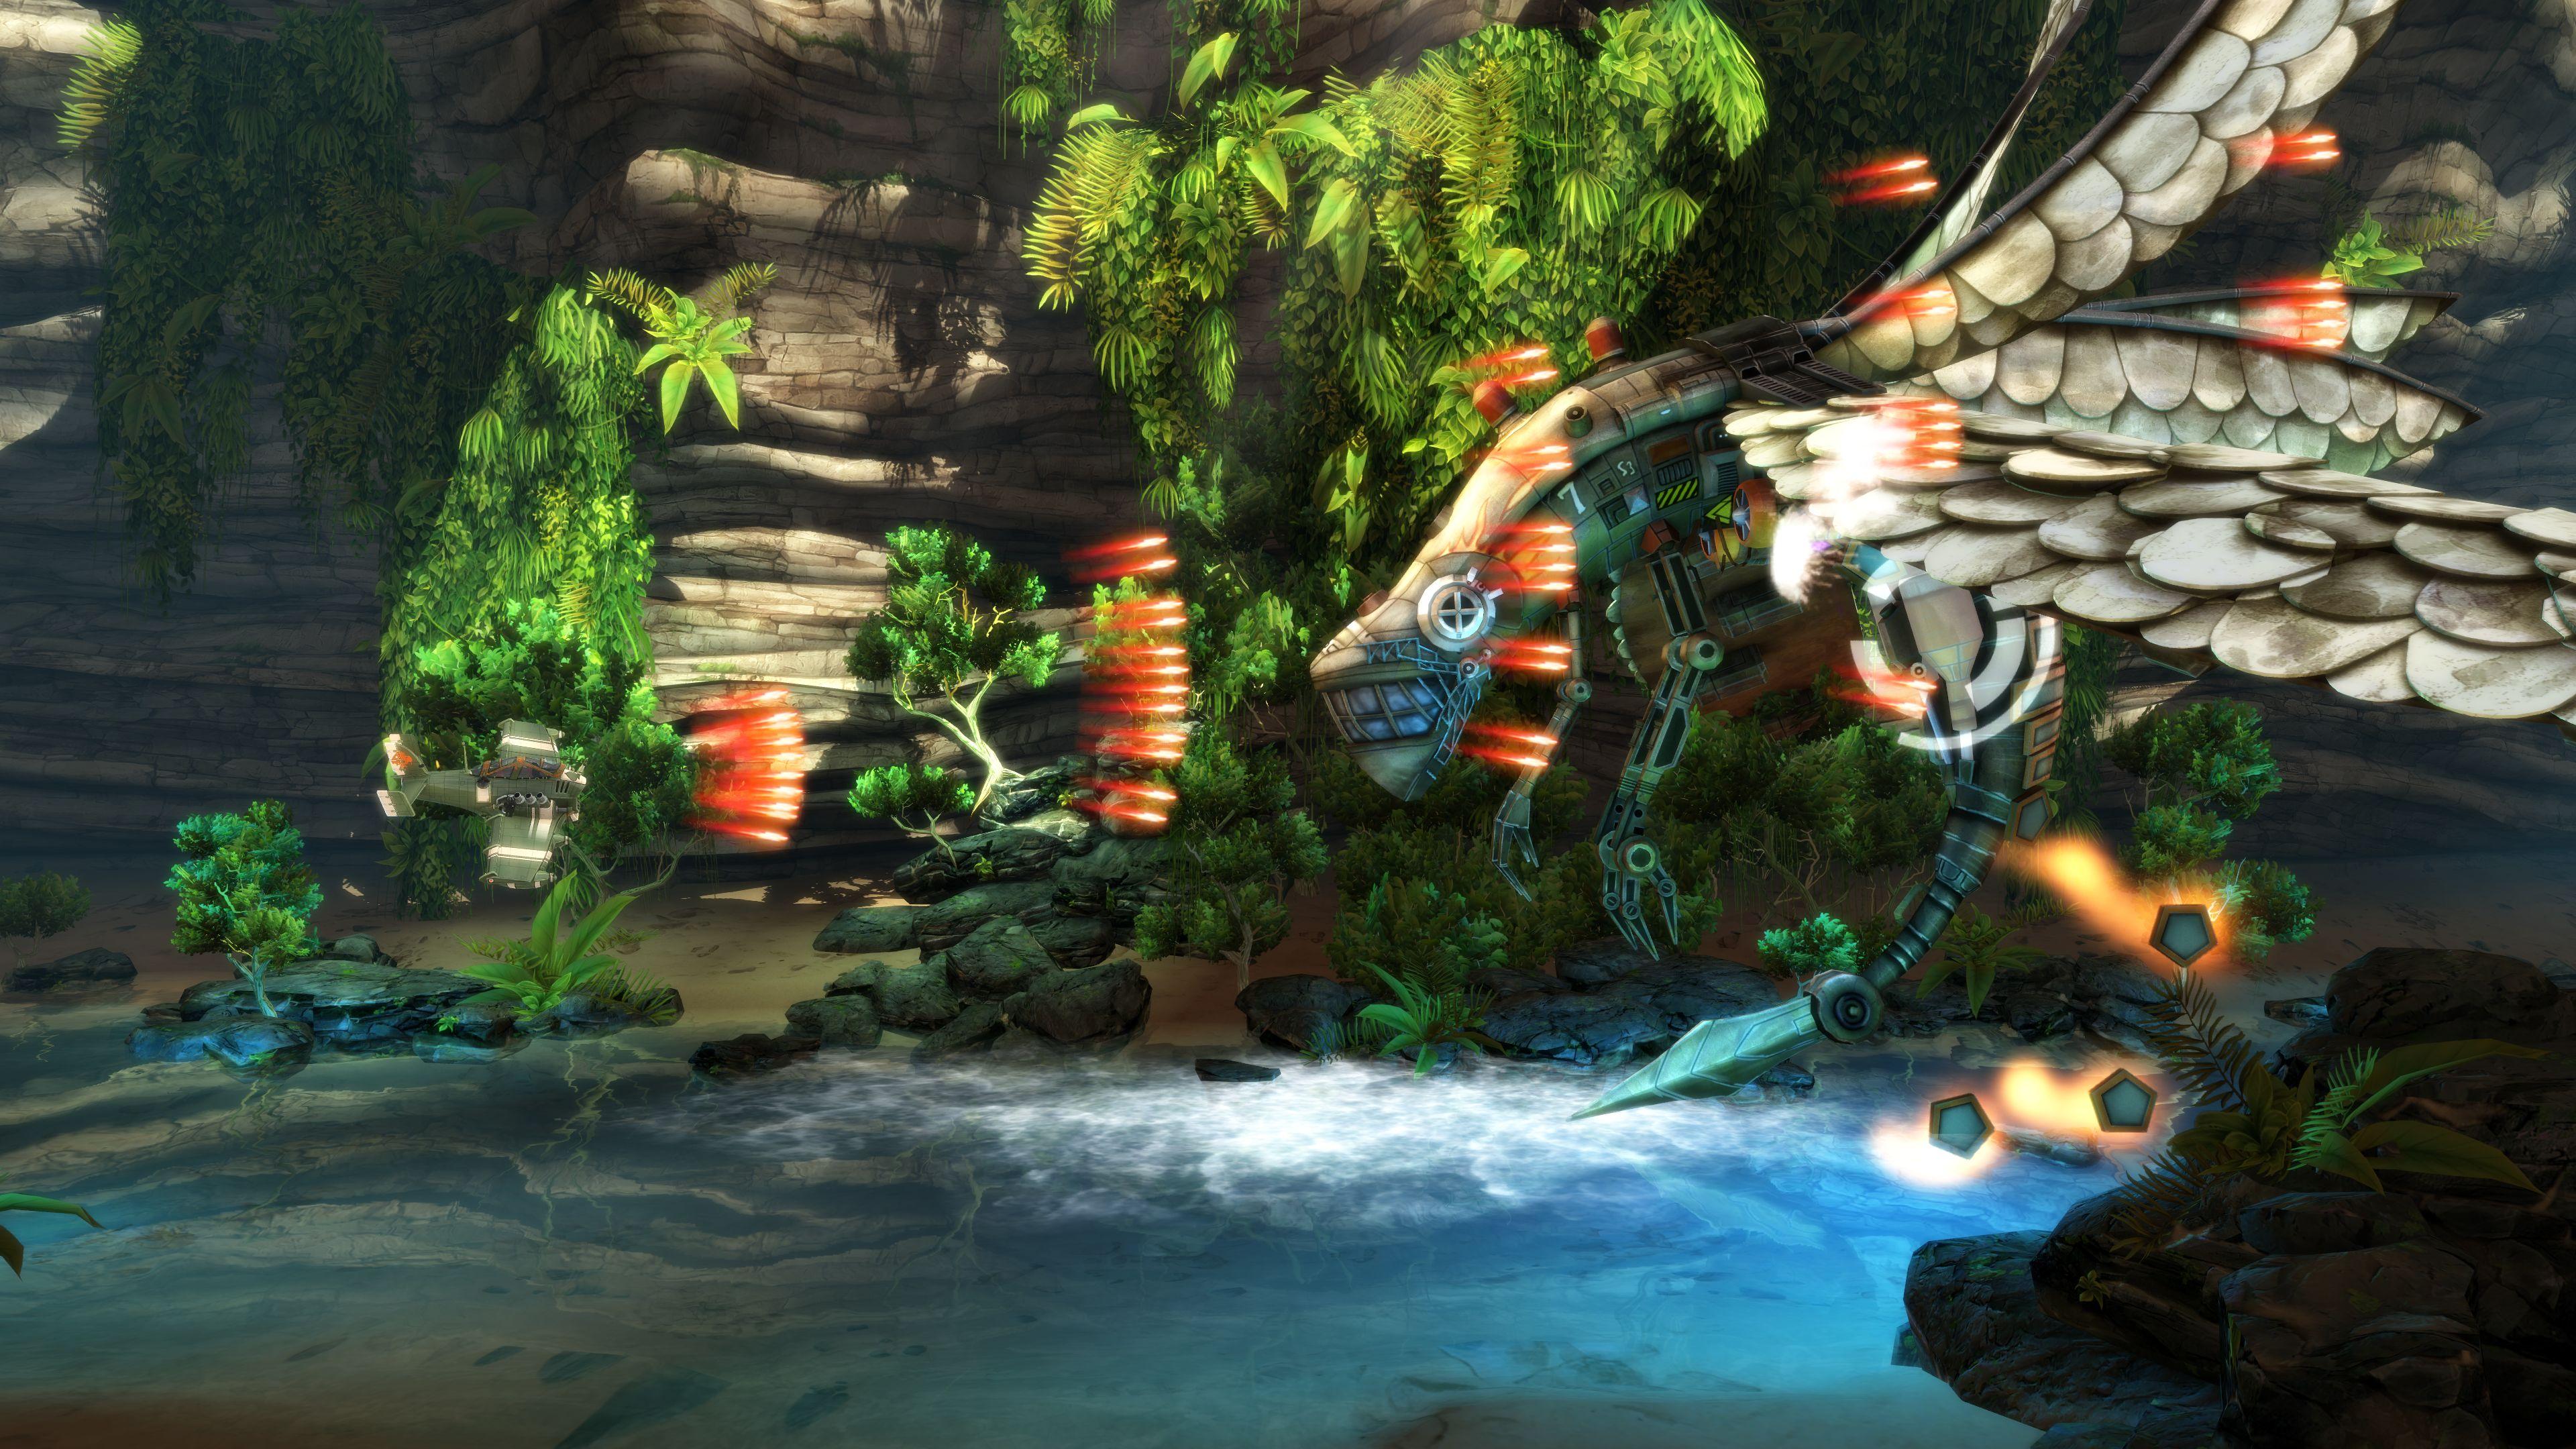 Hry pro Switch se rozrostou o Battle Chasers: Nightwar a Sine Mora EX 142168